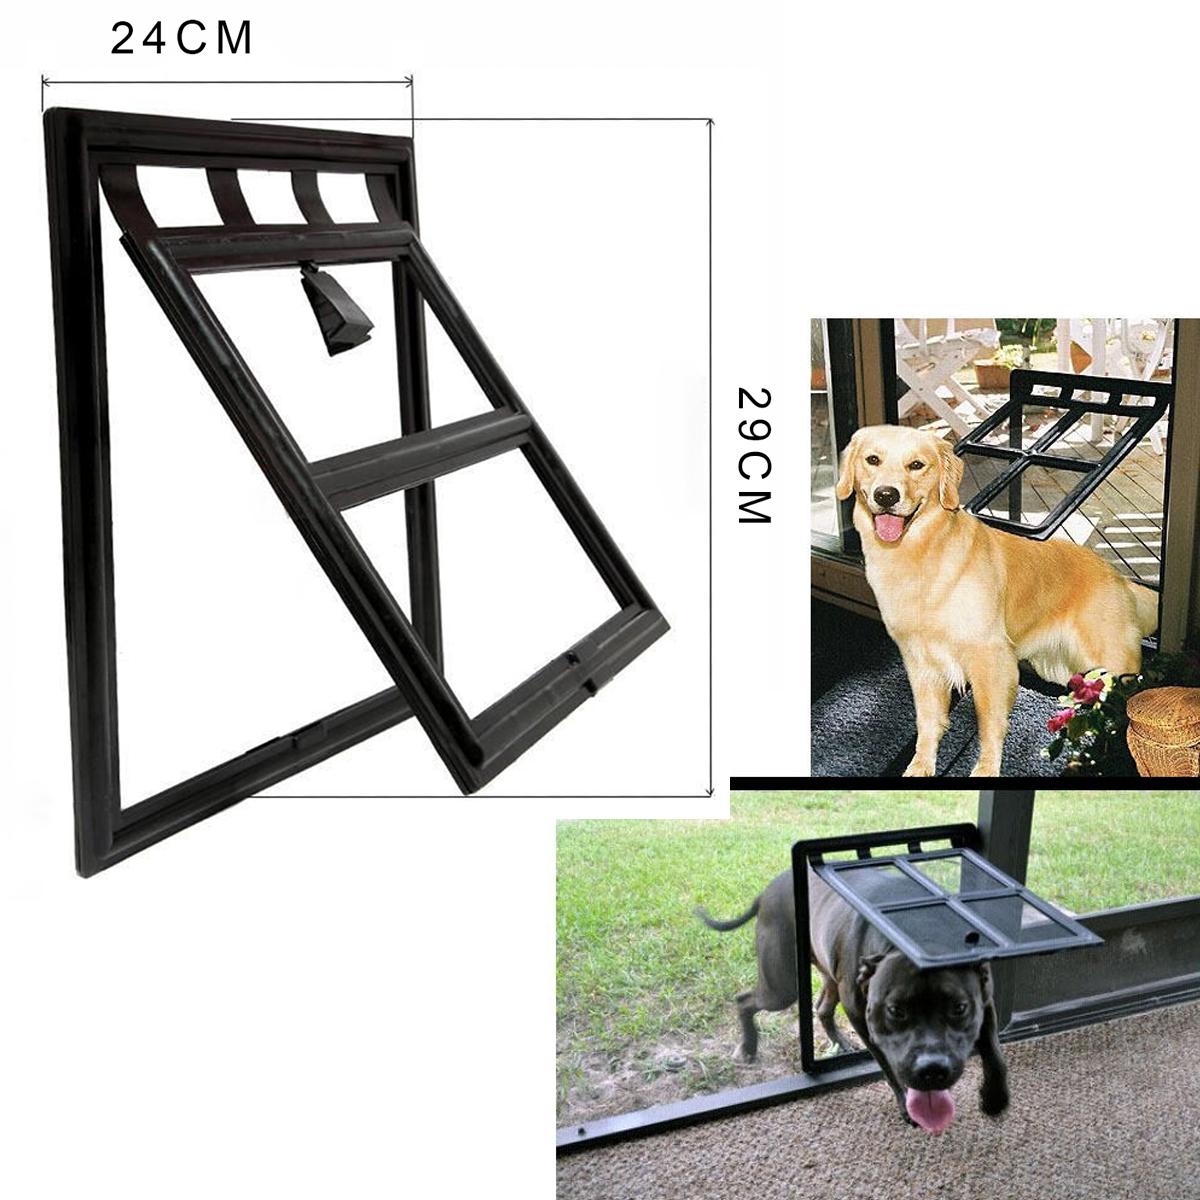 4 Way Small Medium Pet Cat Kitten Dog Supply Lock Lockable Safe Flap Door PS043(China (Mainland))